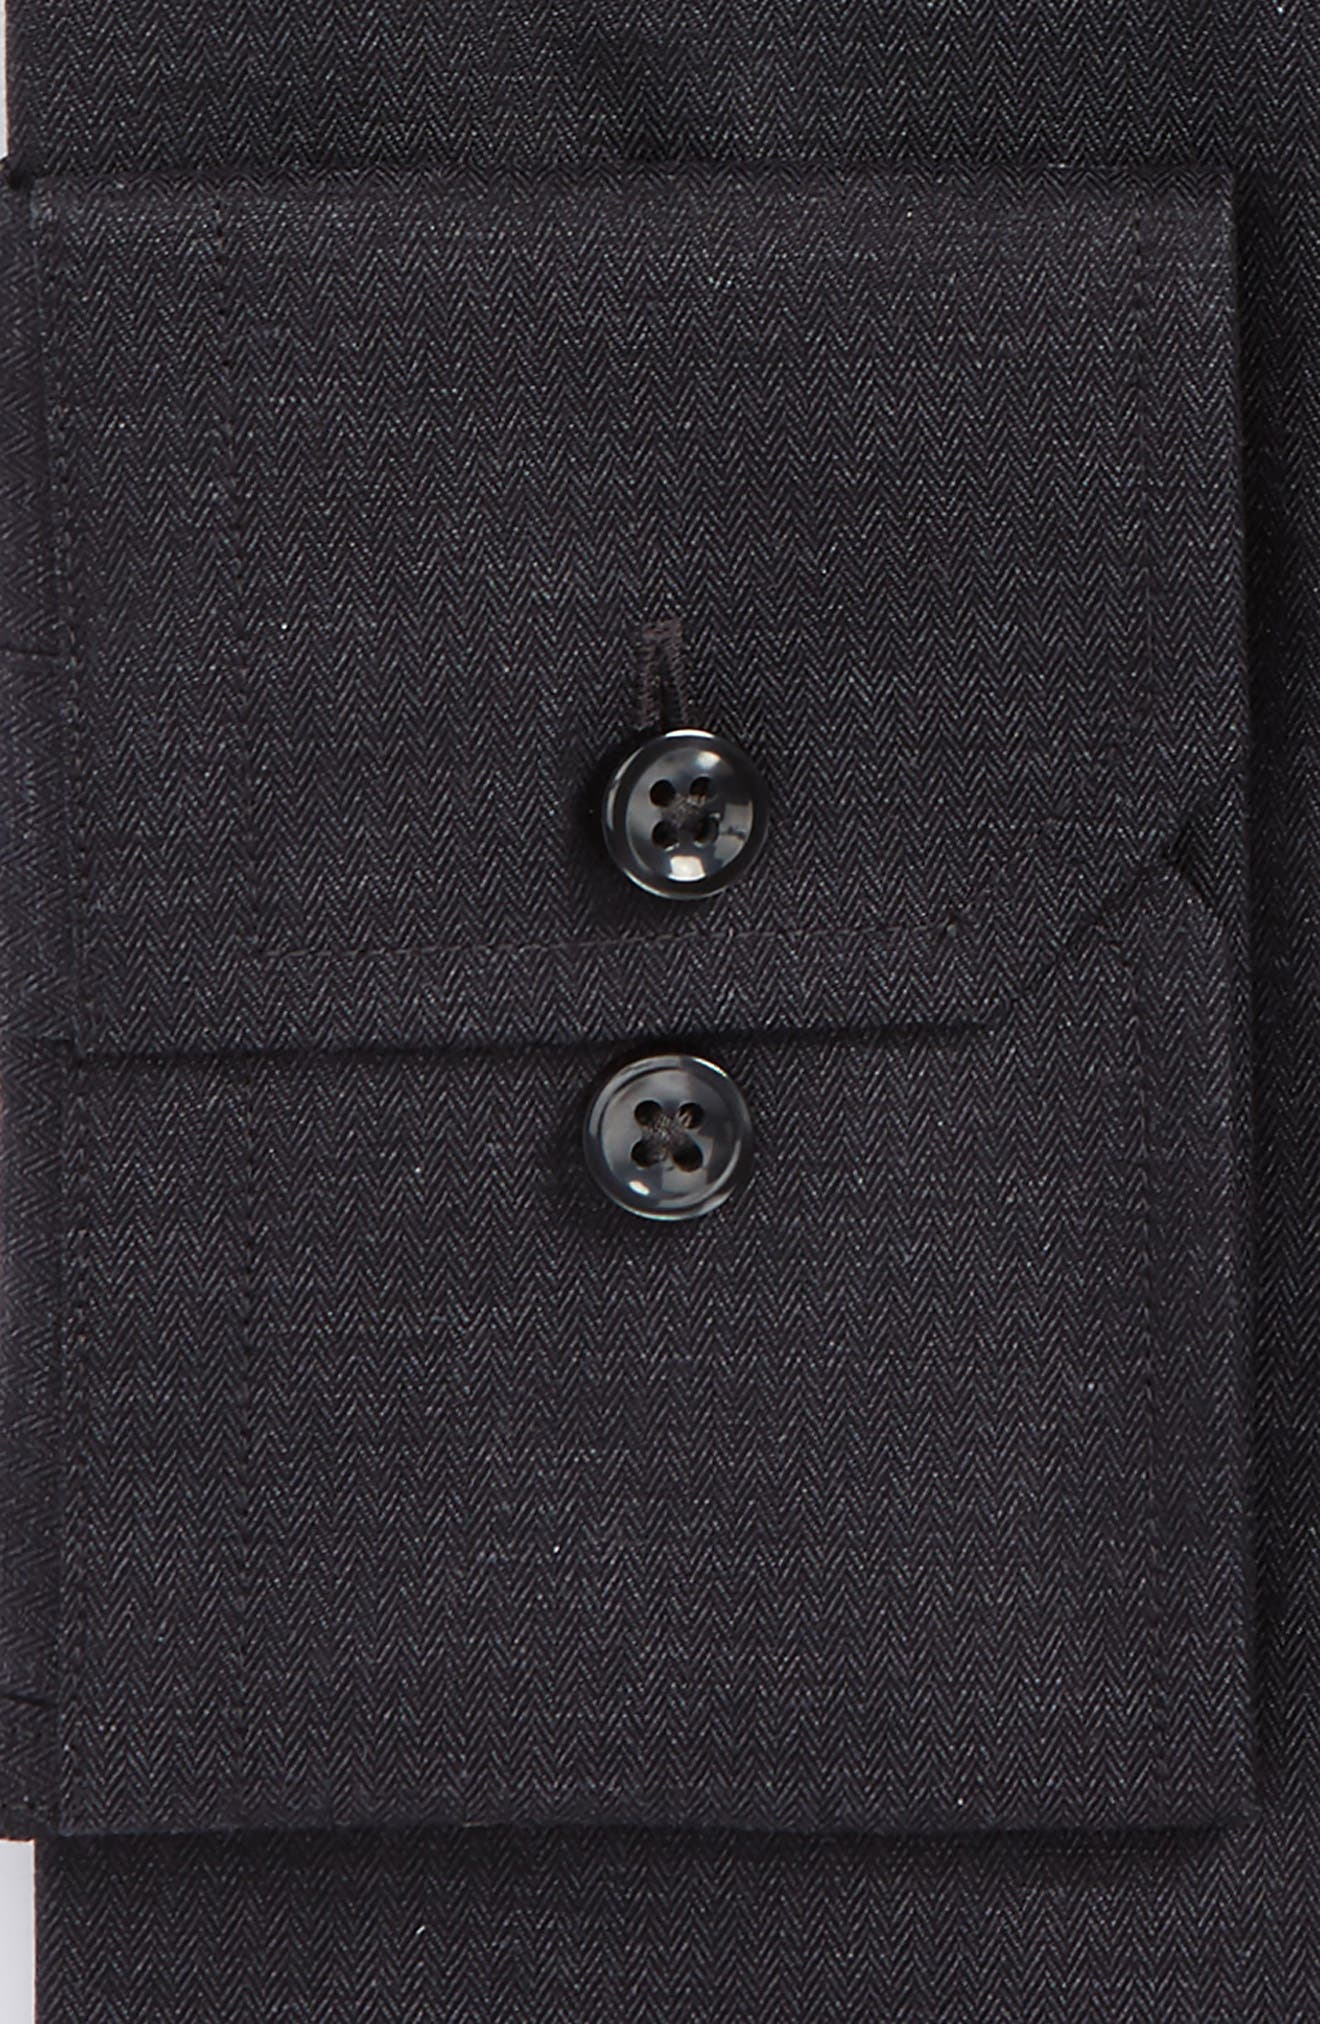 Trim Fit Herringbone Dress Shirt,                             Alternate thumbnail 2, color,                             Charcoal